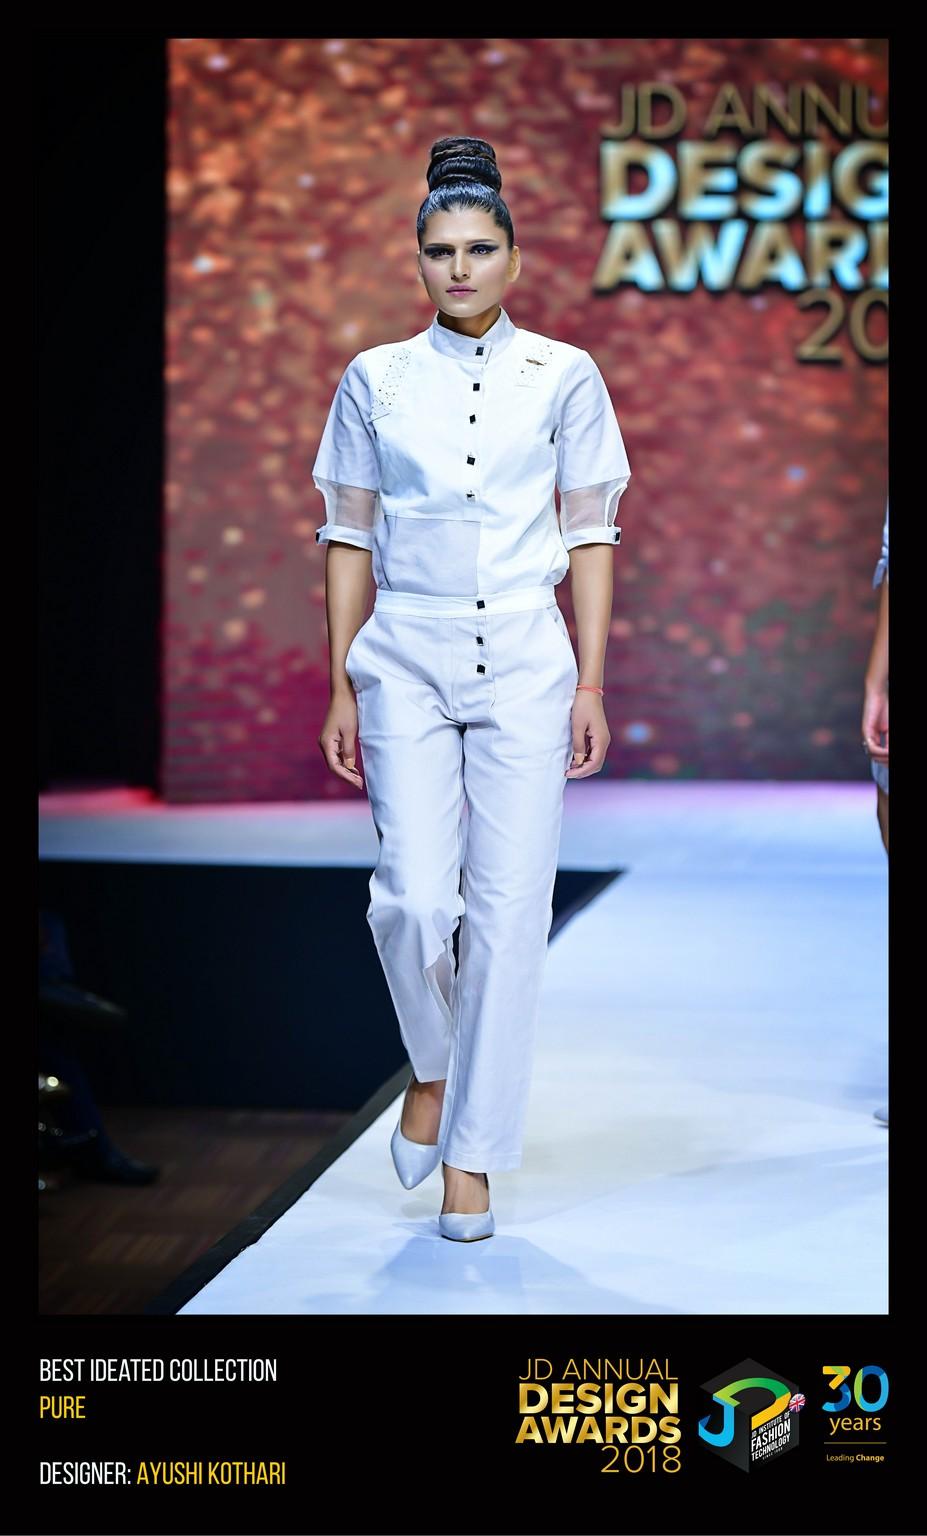 Pure – Change – JD Annual Design Awards 2018 | Designer: Ayushi Kothari (ADFD 2015 Batch) | Photography : Jerin Nath (@jerin_nath) pure - Pure10 - Pure – Change – JD Annual Design Awards 2018